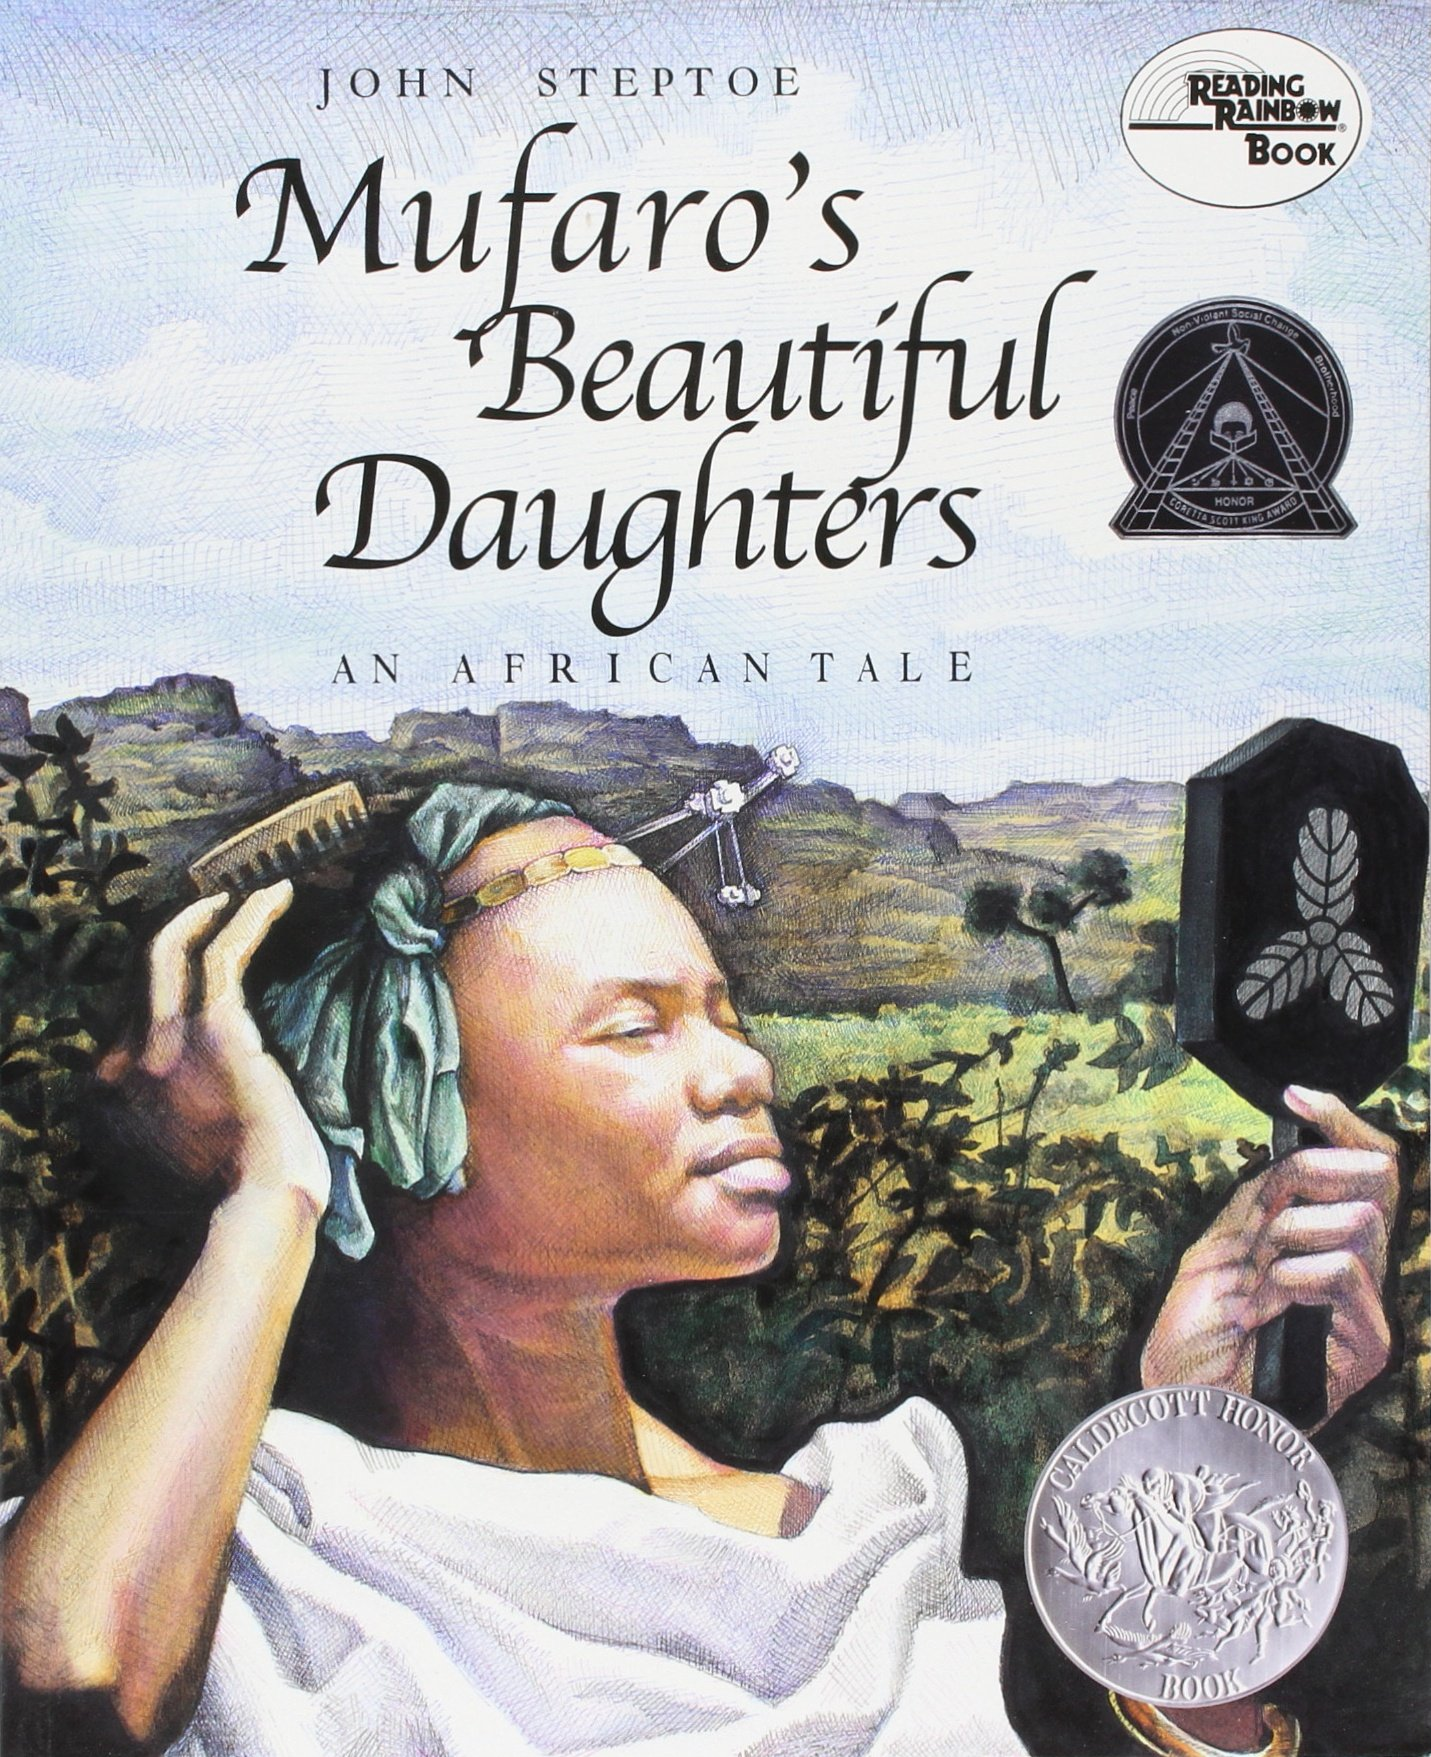 Mufaro's Beautiful Daughters.: Steptoe, John.: Amazon.com: Books